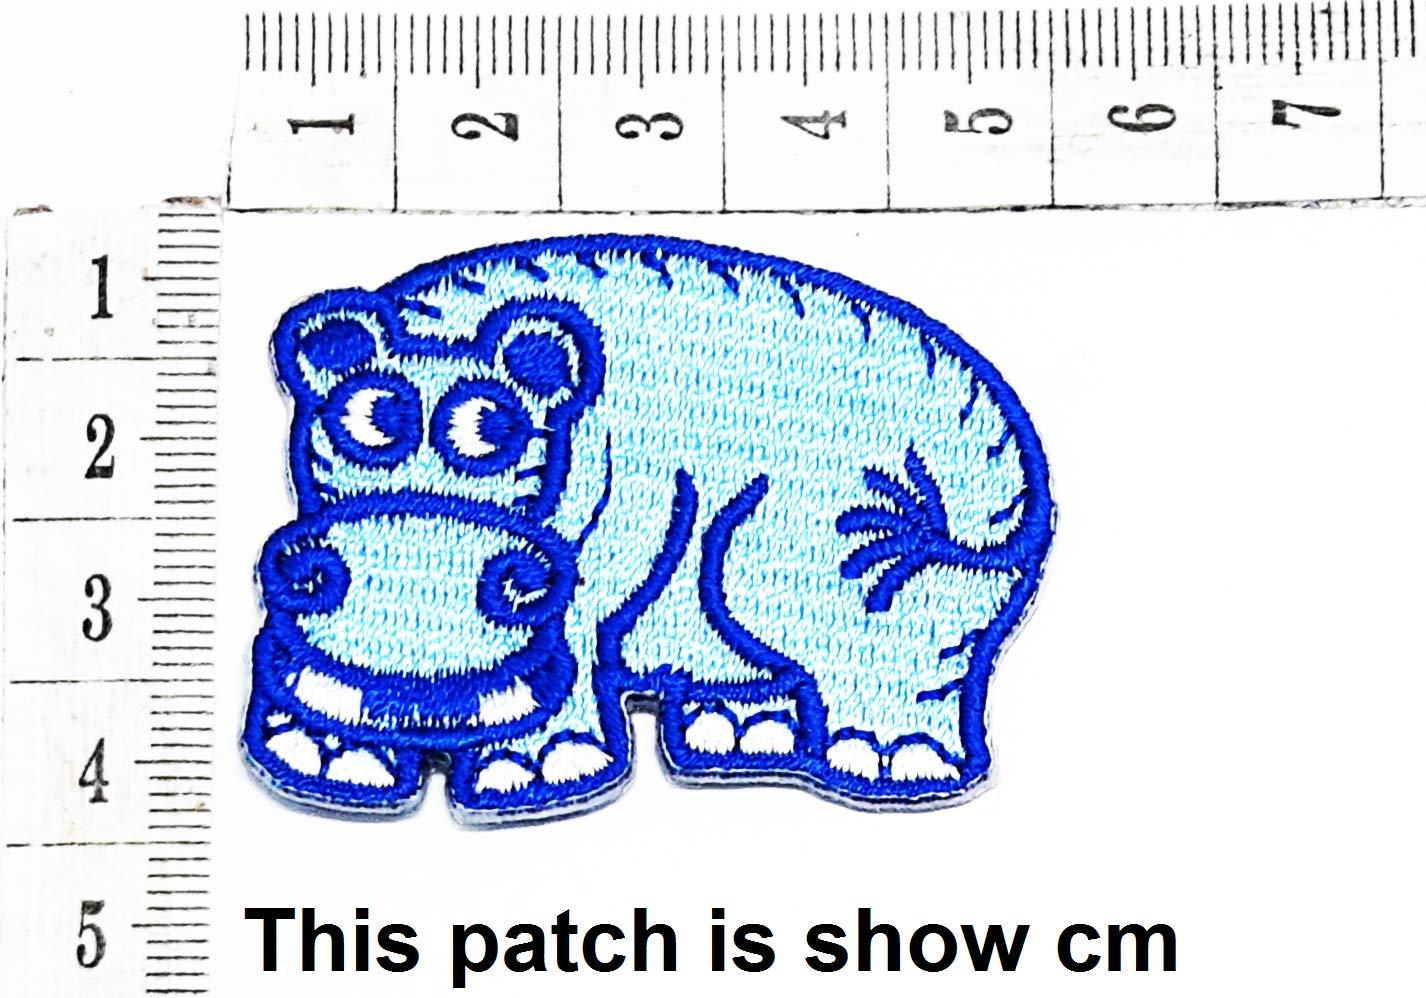 Baby Blue Hippo Animal Funny Cartoon Chidren Kids Embroidren Iron Patch/Logo Sew On Patch Clothes Bag T-Shirt Jeans Biker Badge Applique Devil Artwork